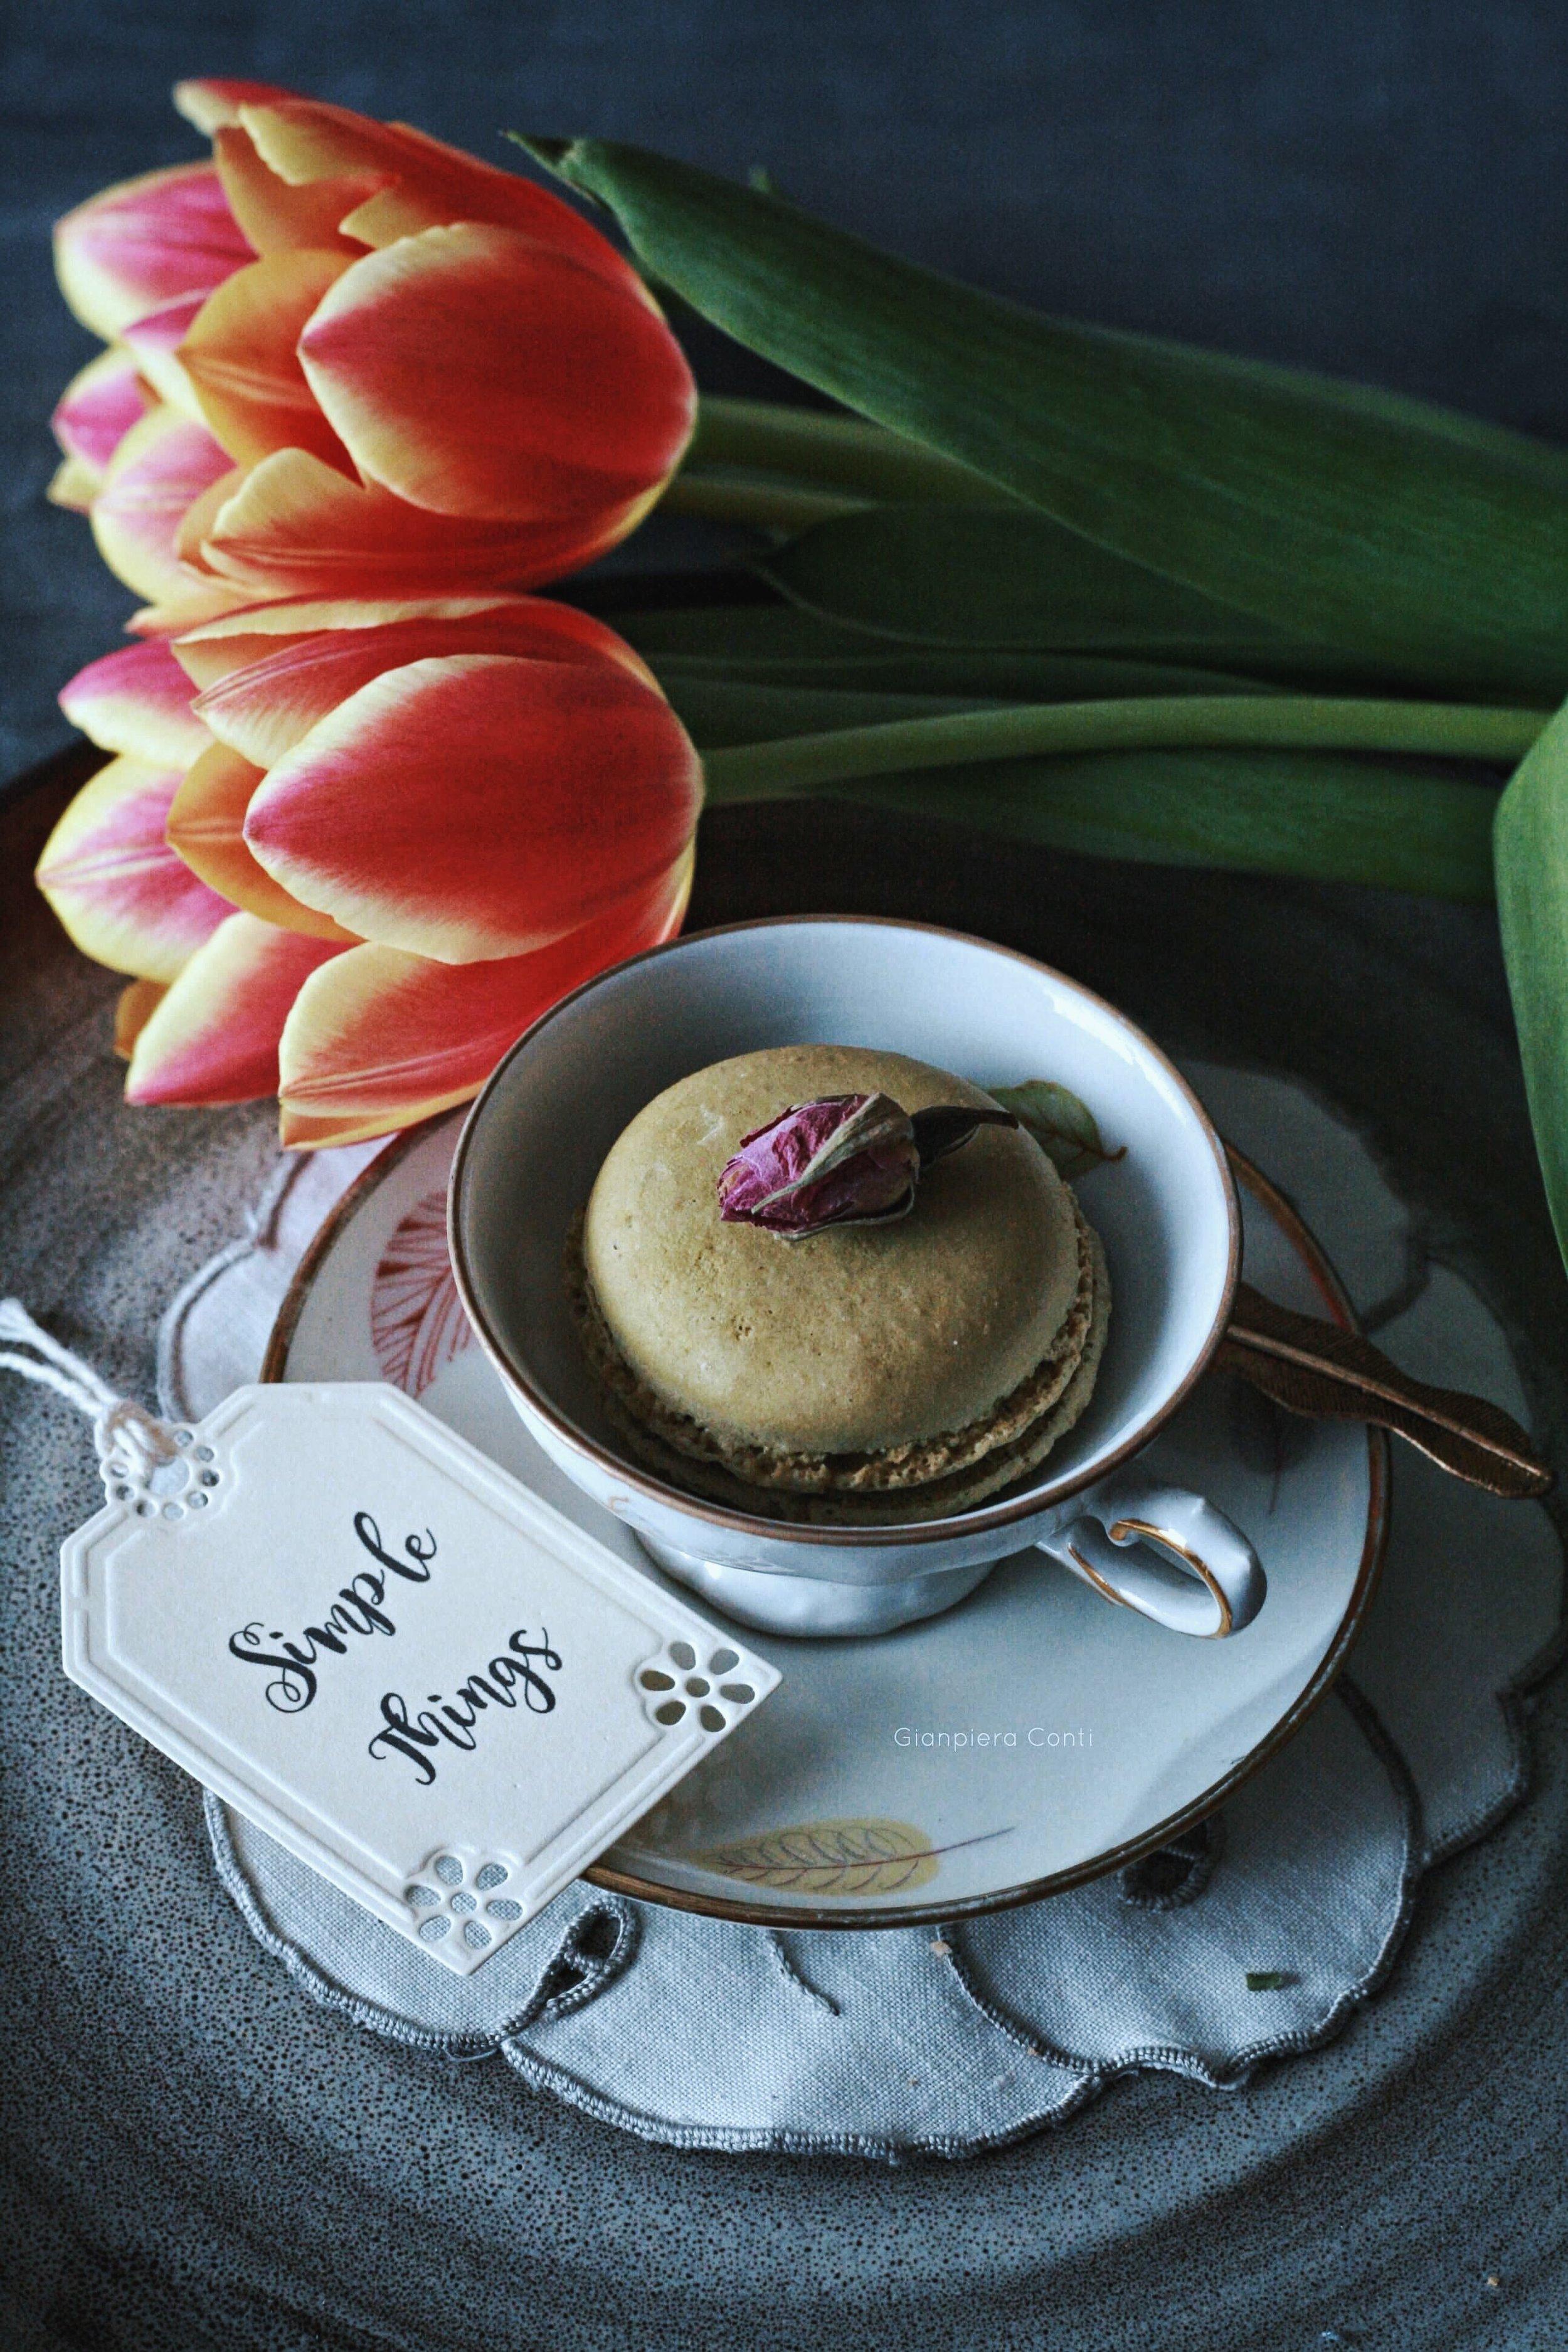 Macaron and Tulips Wat.JPG